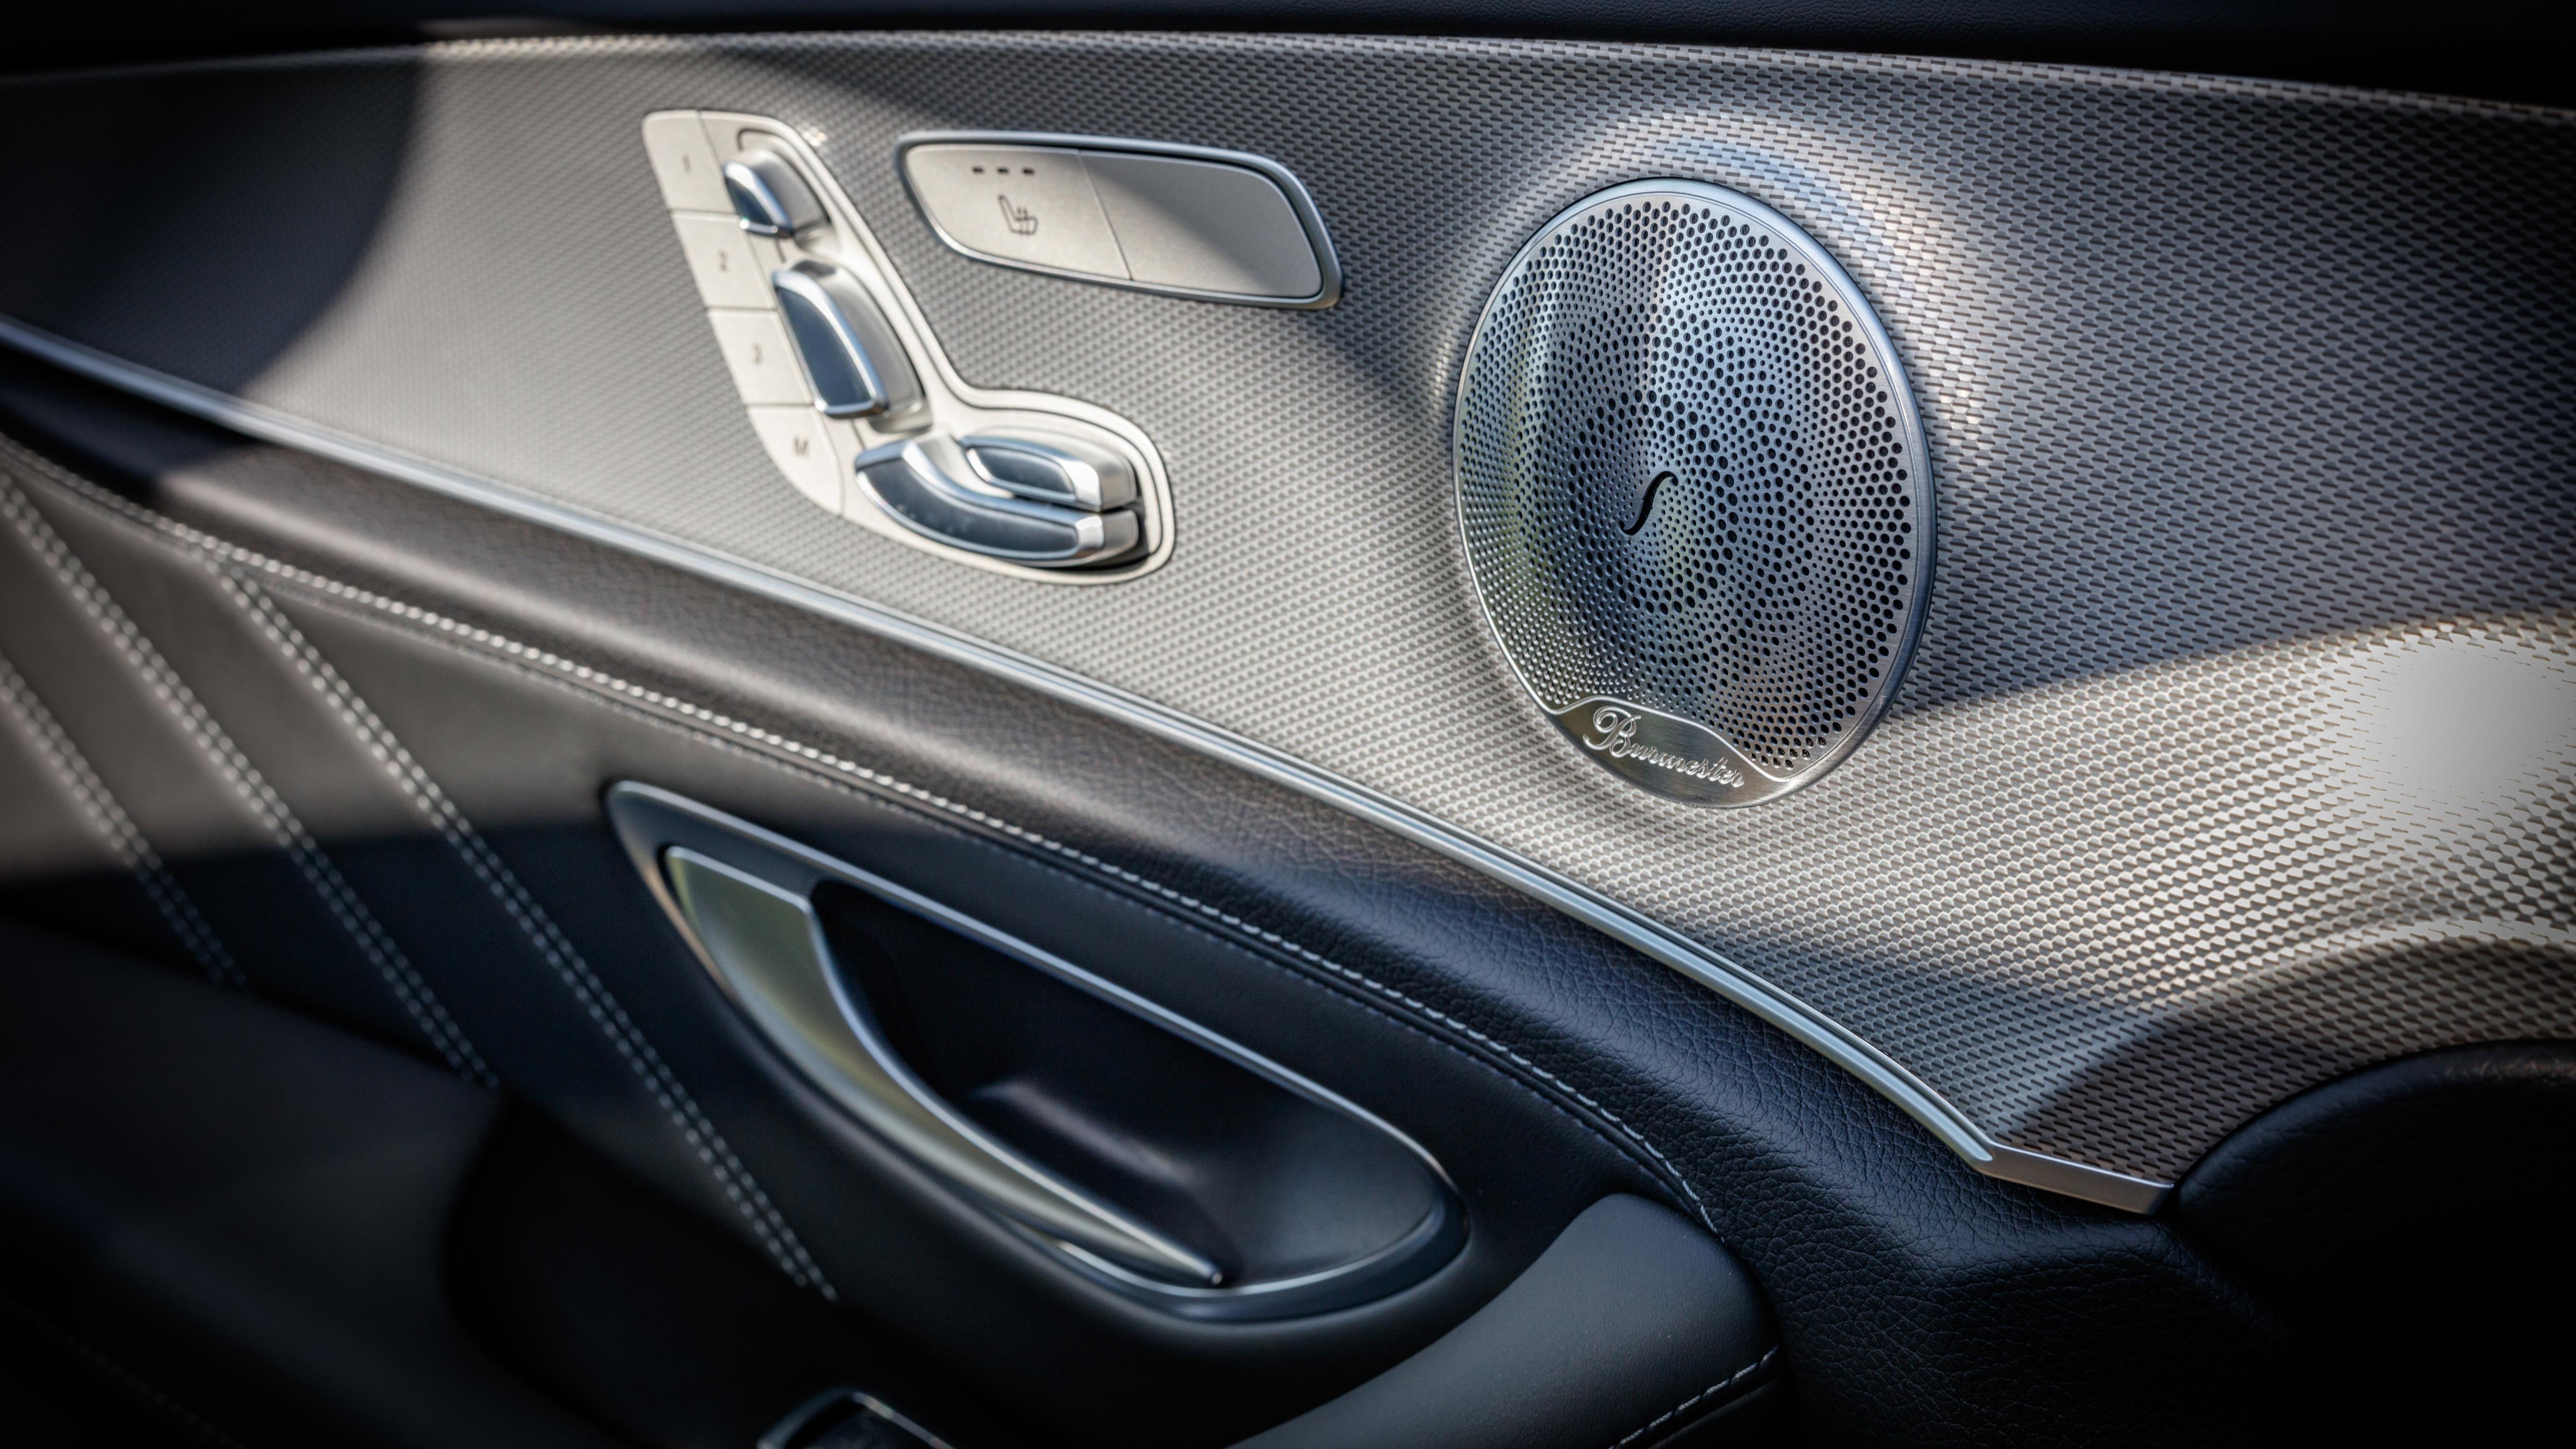 Mercedes-AMG E63 S+ estate interior details